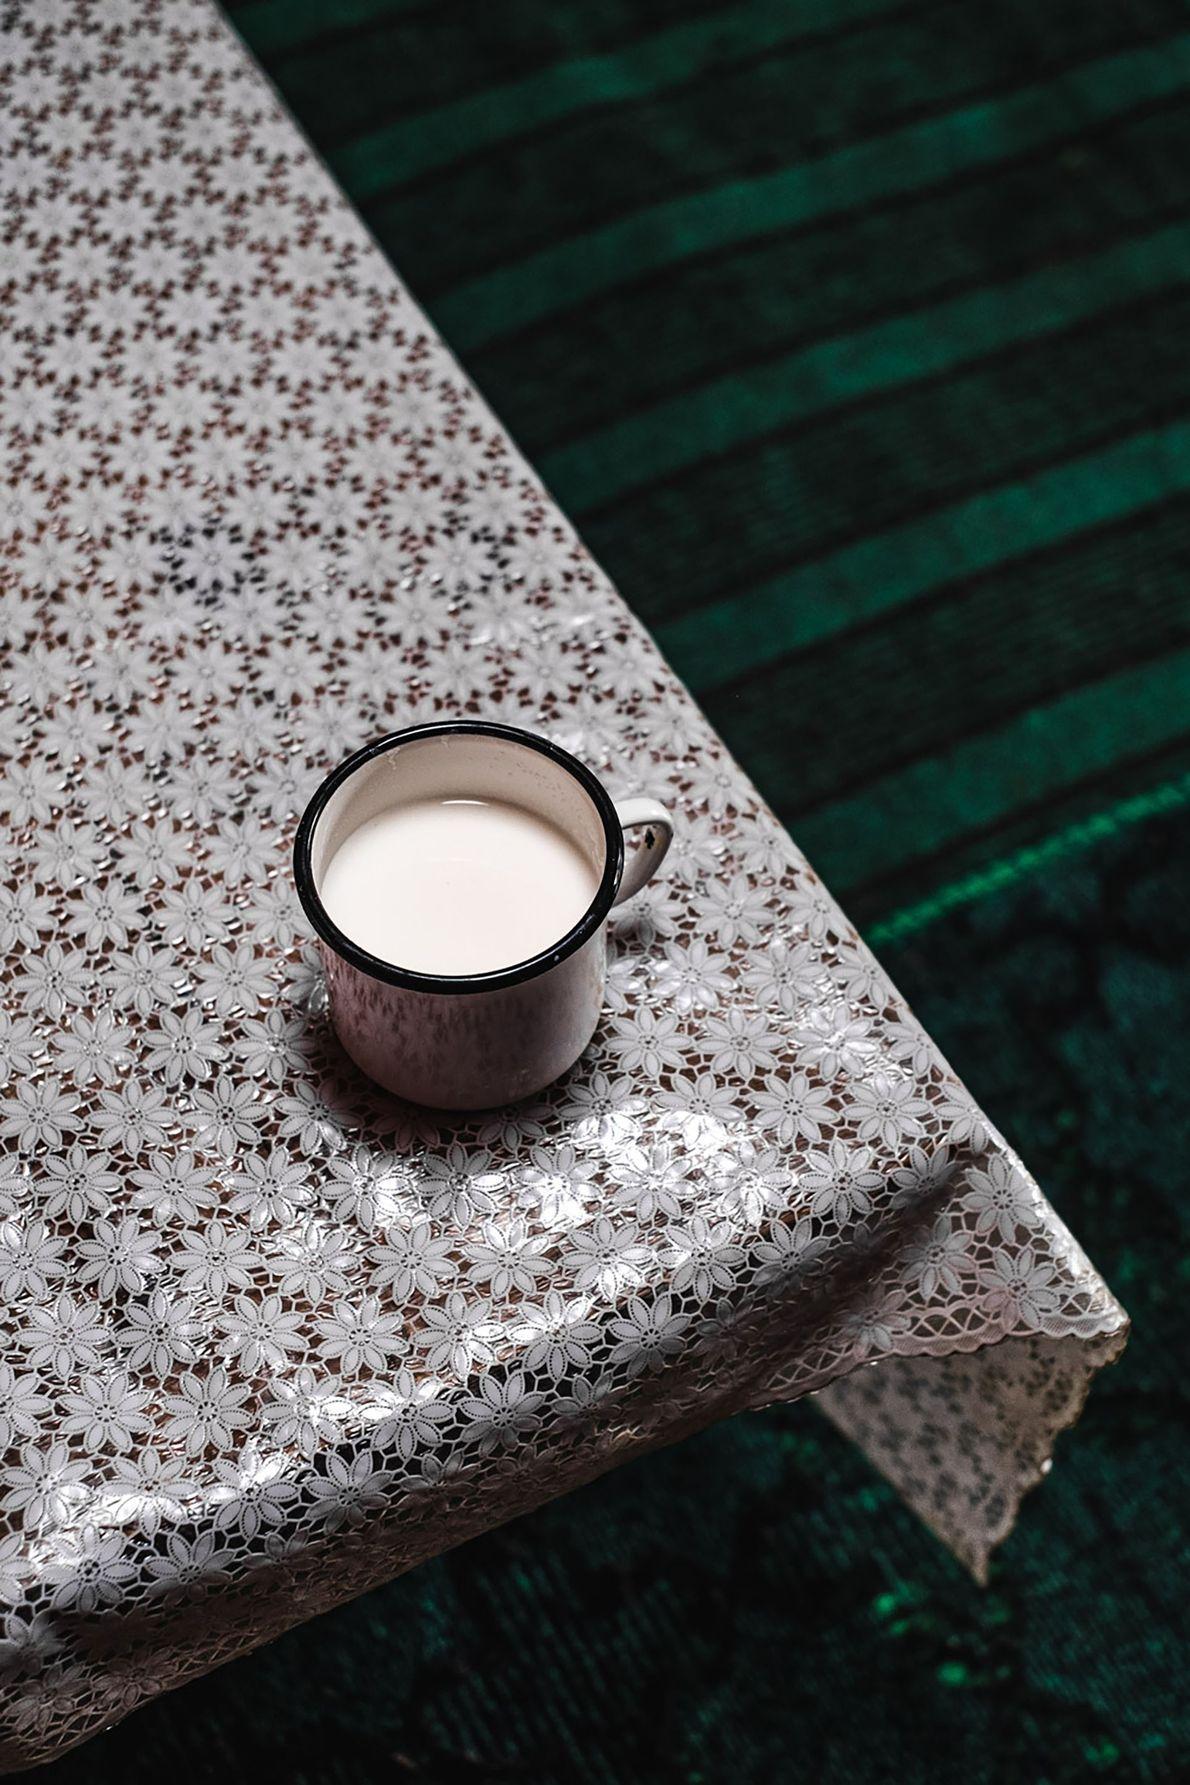 A glass of fresh mare milk.